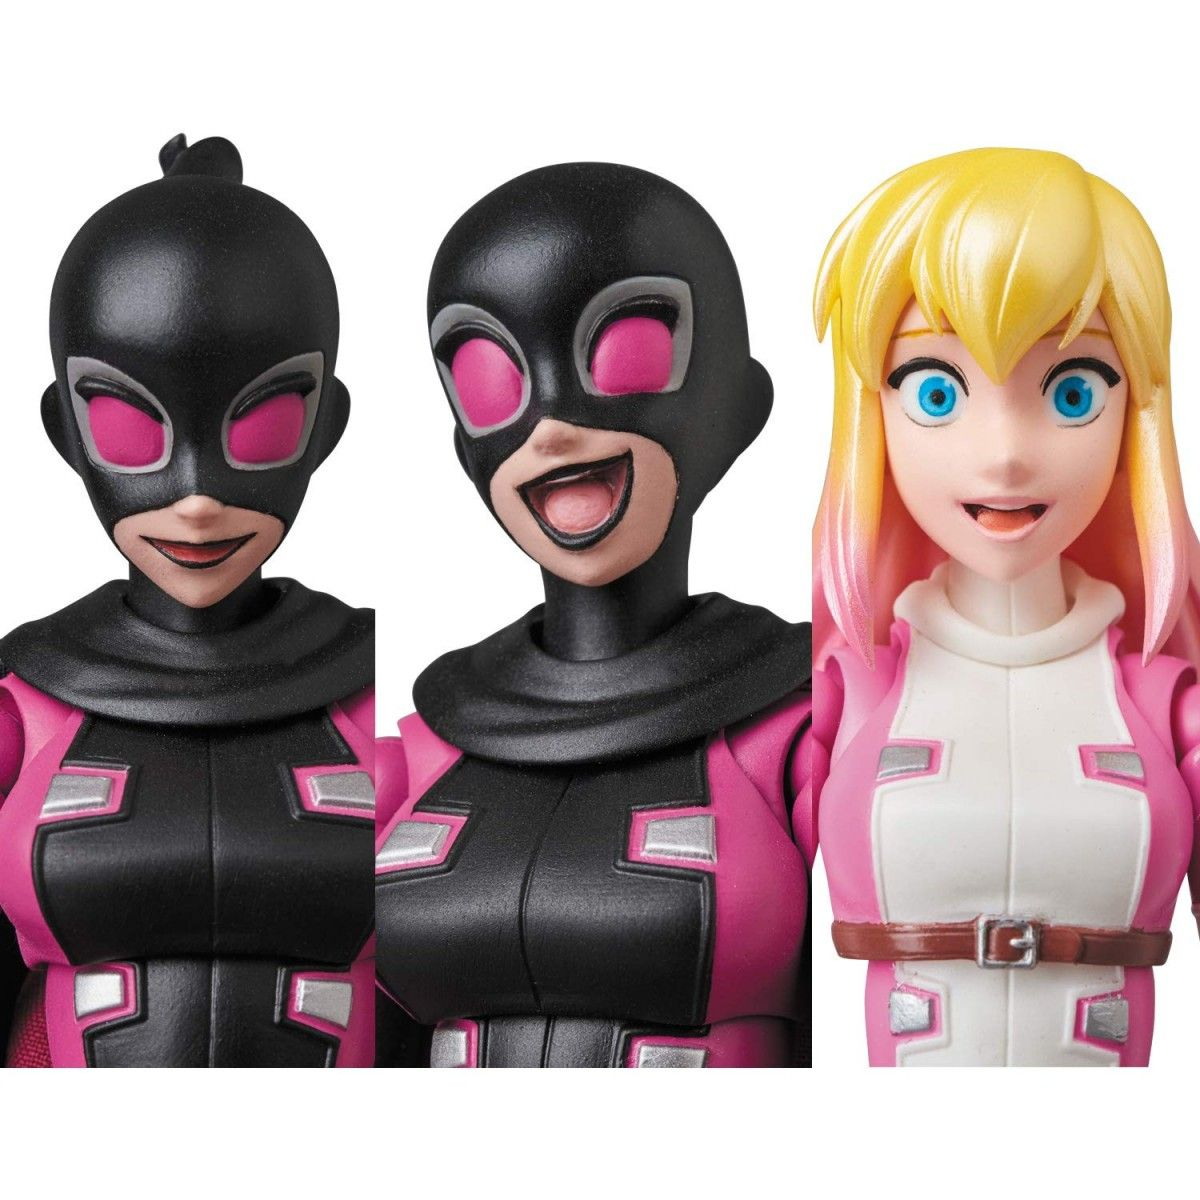 Medicom Toy MAFEX Gwen Pool Action Figure Gwenpool Comics Marvel